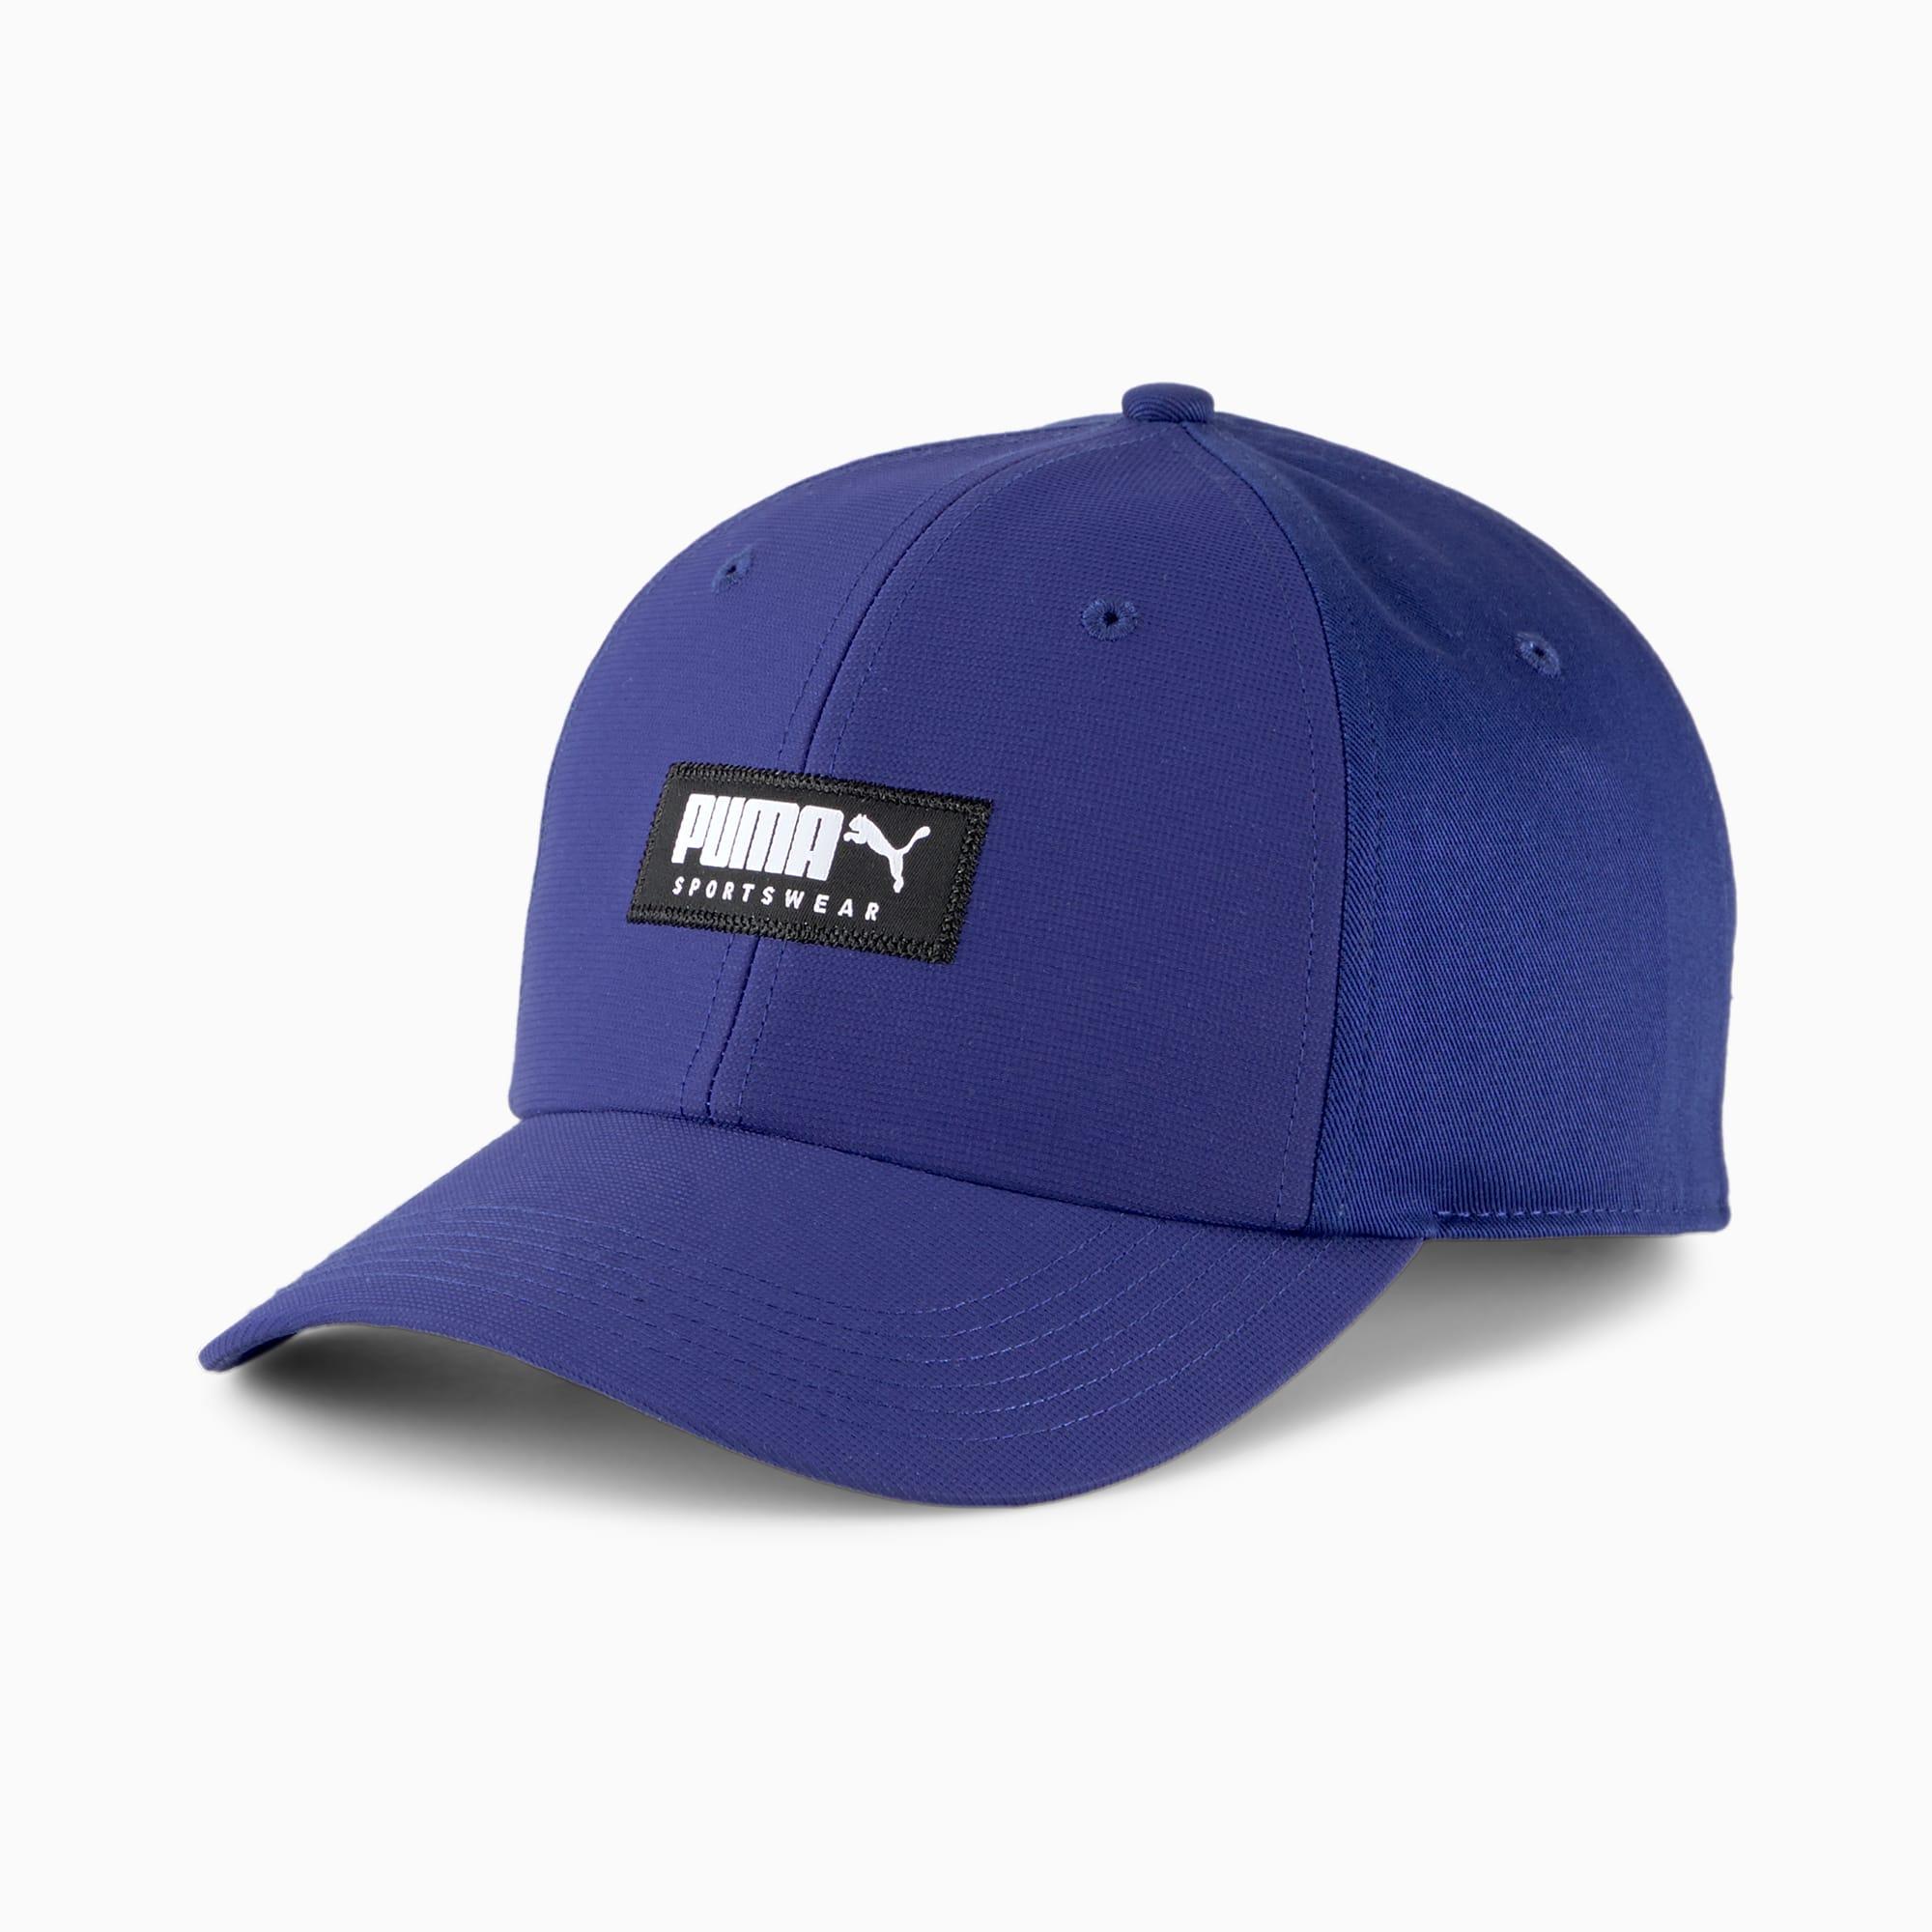 Casquette de baseball Style, Bleu, Accessoires - PUMA - Modalova